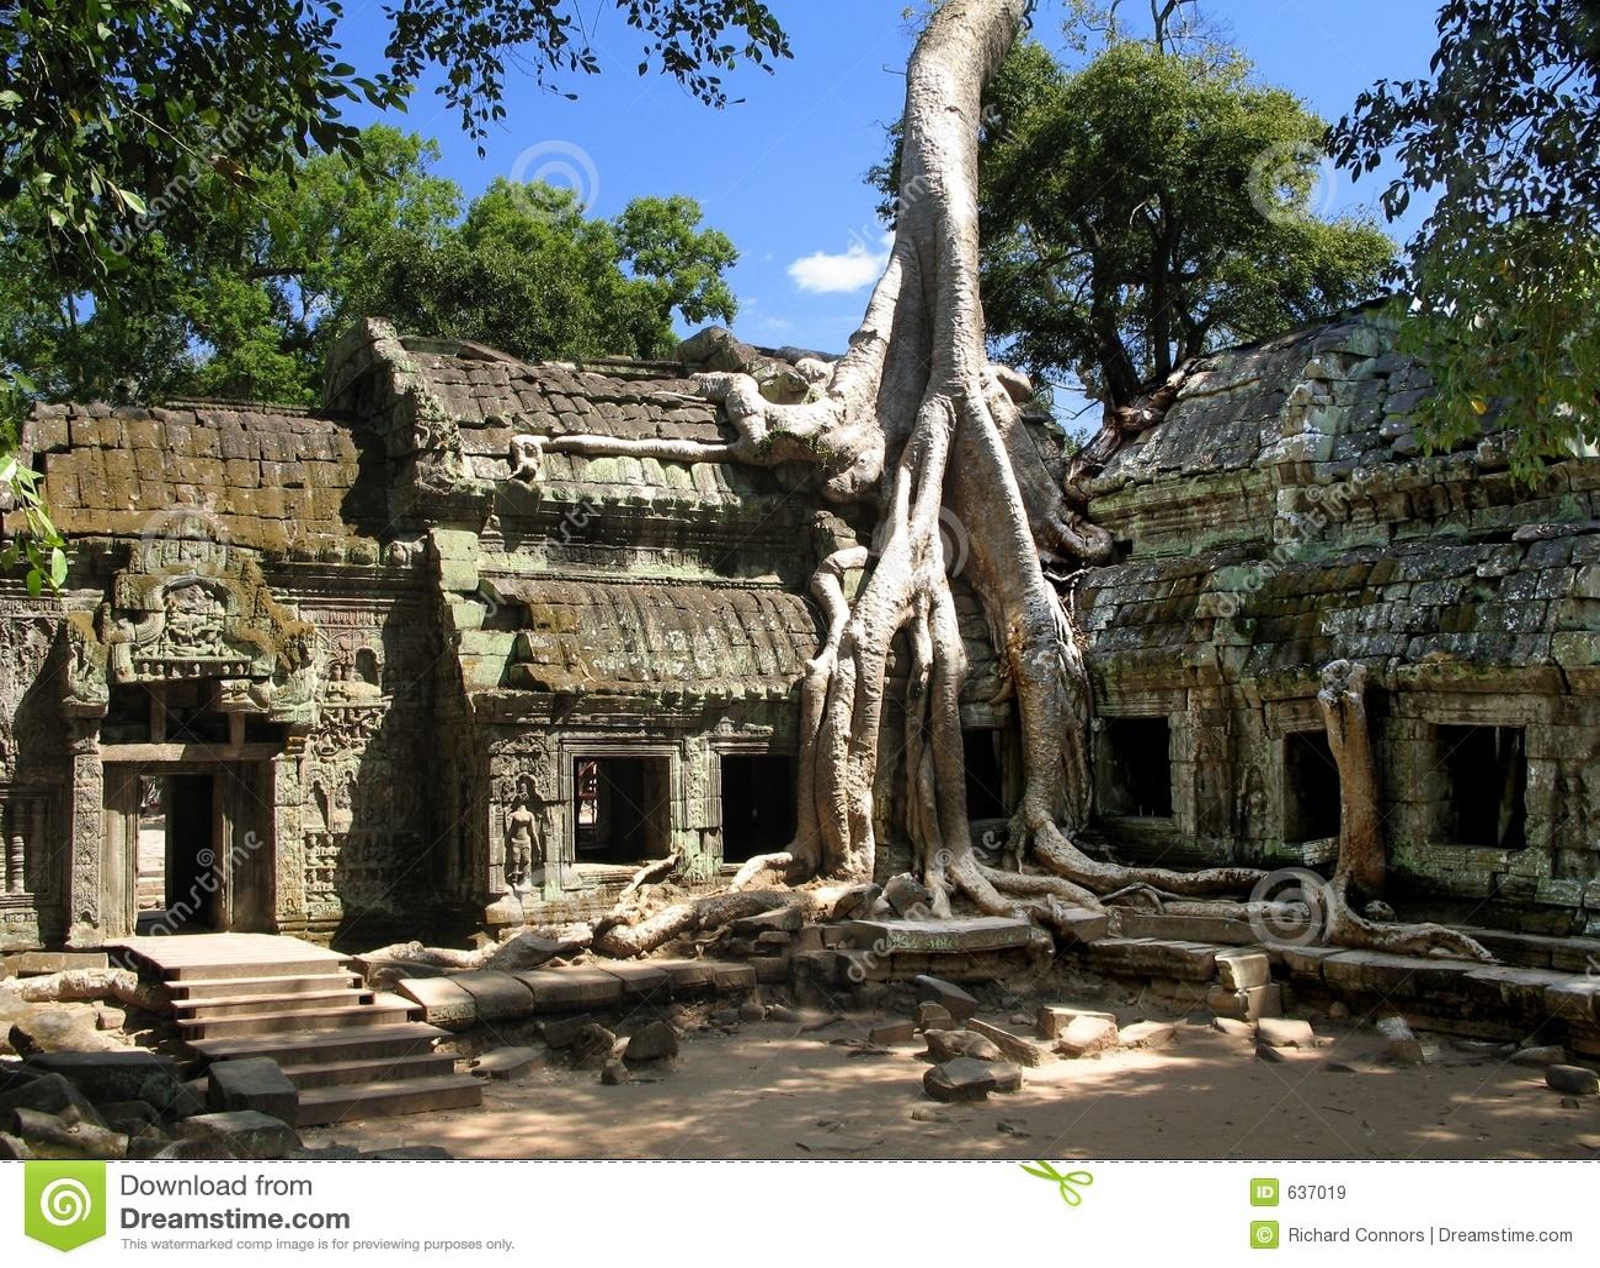 A silk-cotton tree consumes the ancient ruins of Ta Prohm, Angkor, Cambodia